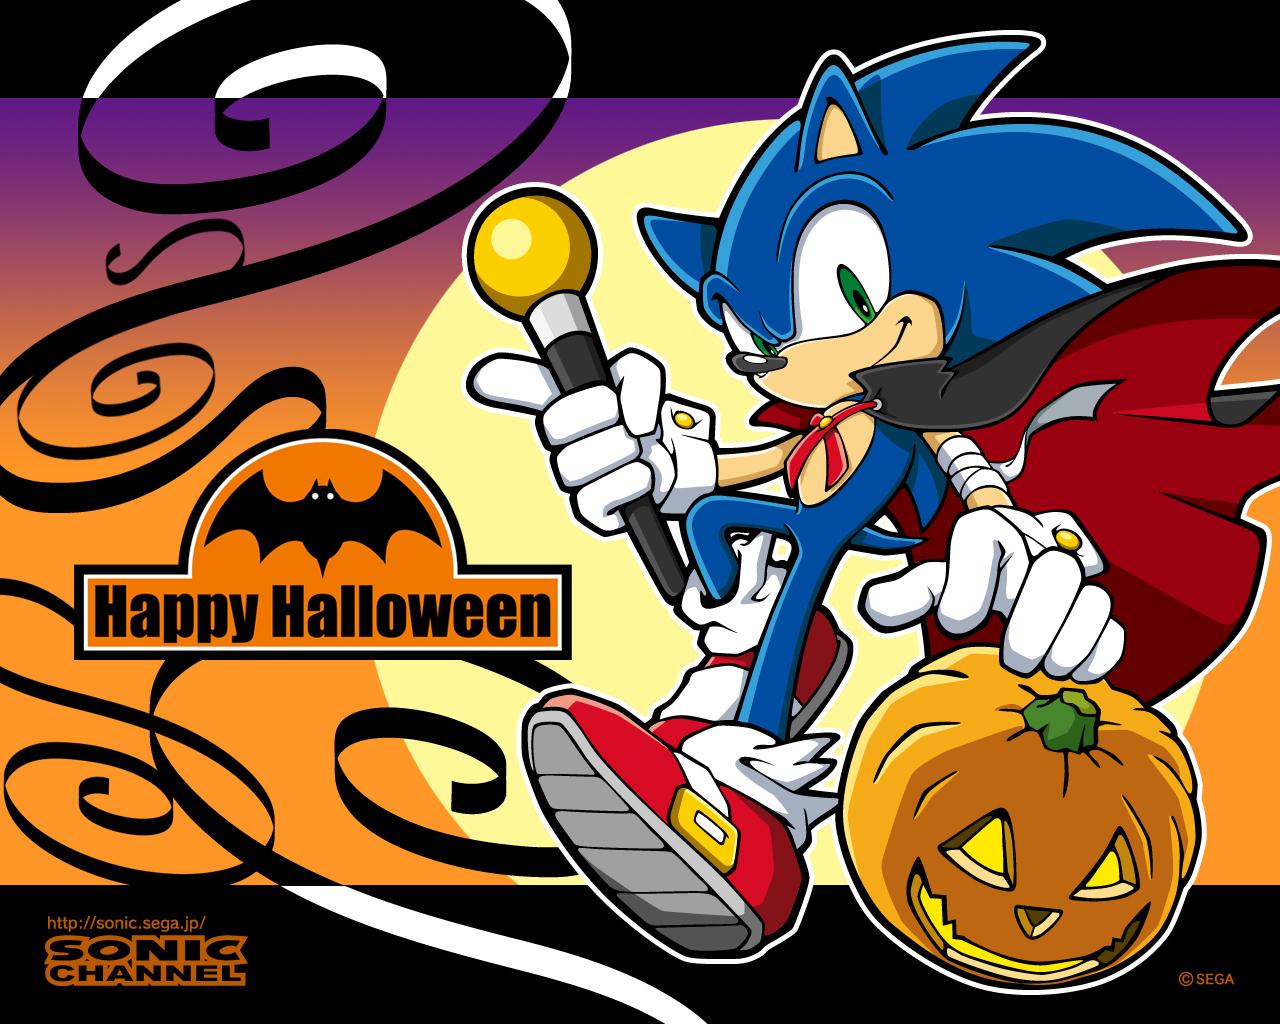 http://3.bp.blogspot.com/-z2_z4vtTqS8/UEwgp5zdR-I/AAAAAAAAAGs/ot-lyjR-q24/s1600/Sonic-Halloween-Wallpaper-sonic-channel-31456294-1280-1024-775526.jpg